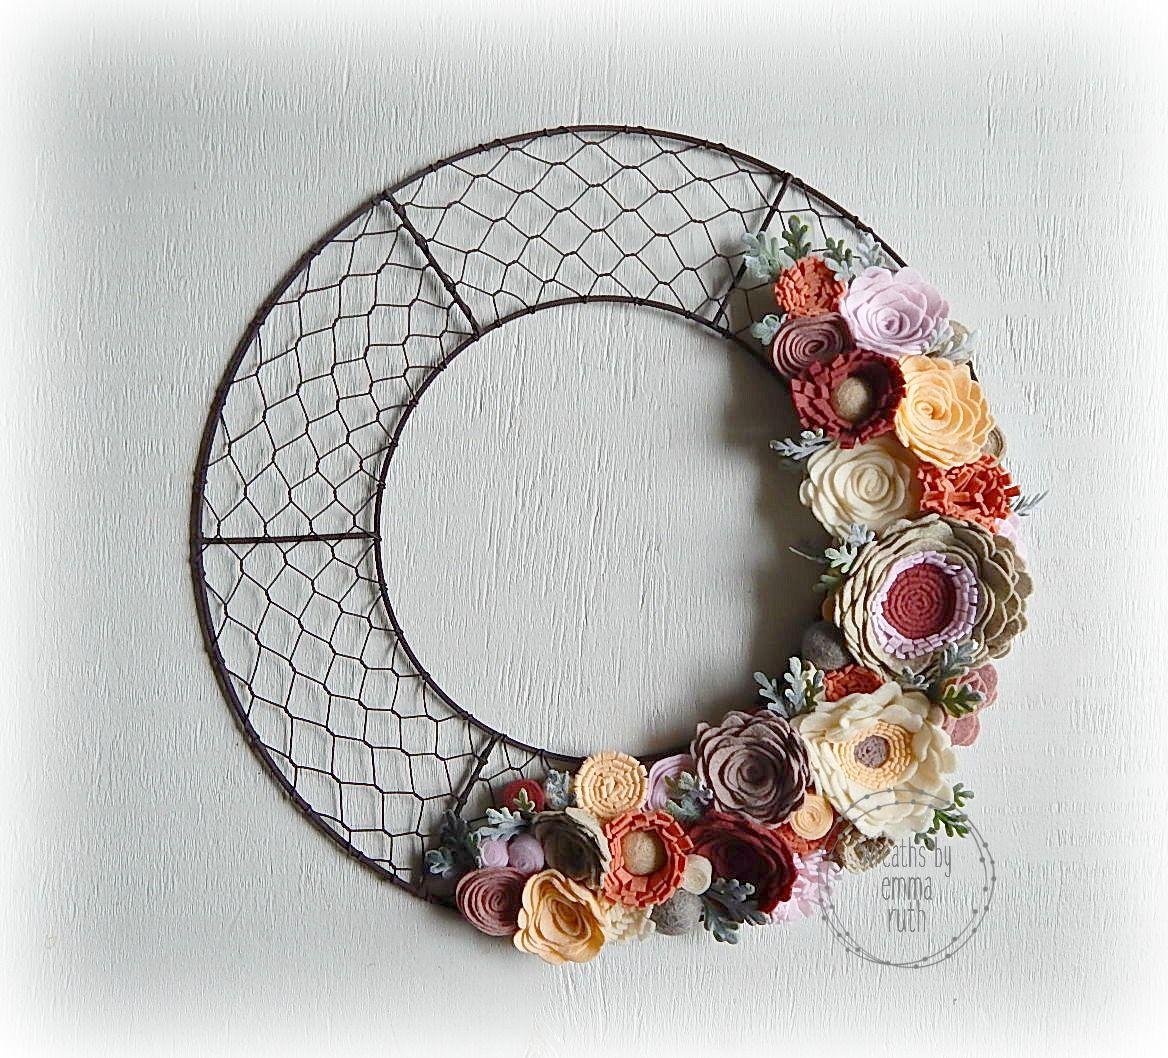 Felt Flower Wreath Chicken Wire Wreath made by Wreaths By Emma Ruth ...